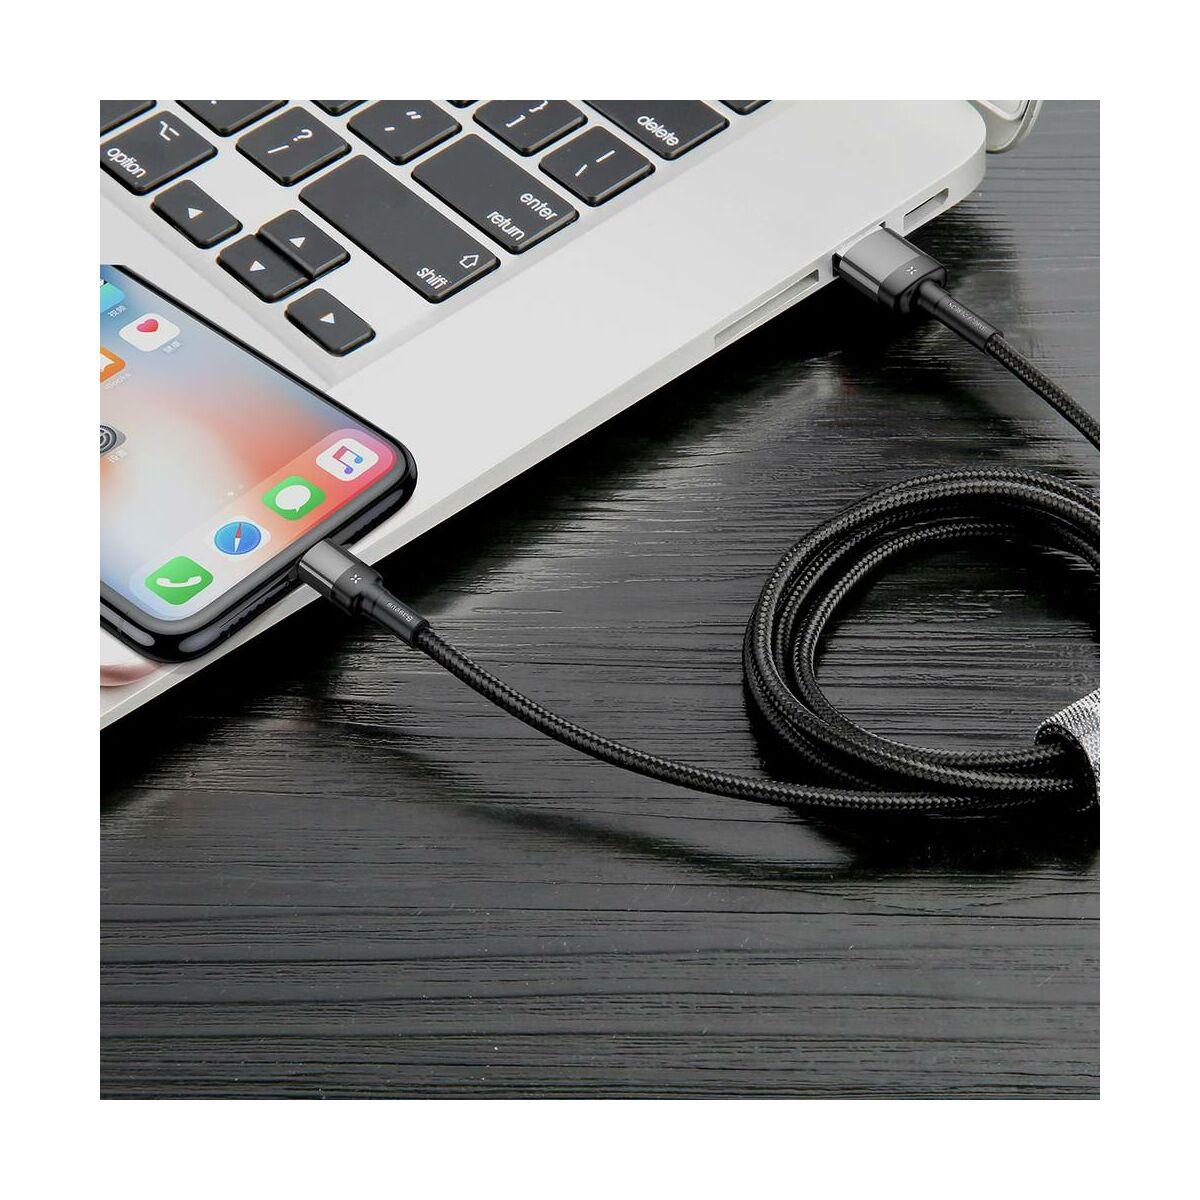 Baseus Lightning kábel, Cafule (special edition) 1.5A, 2m, szürke/fekete (CALKLF-HG1)